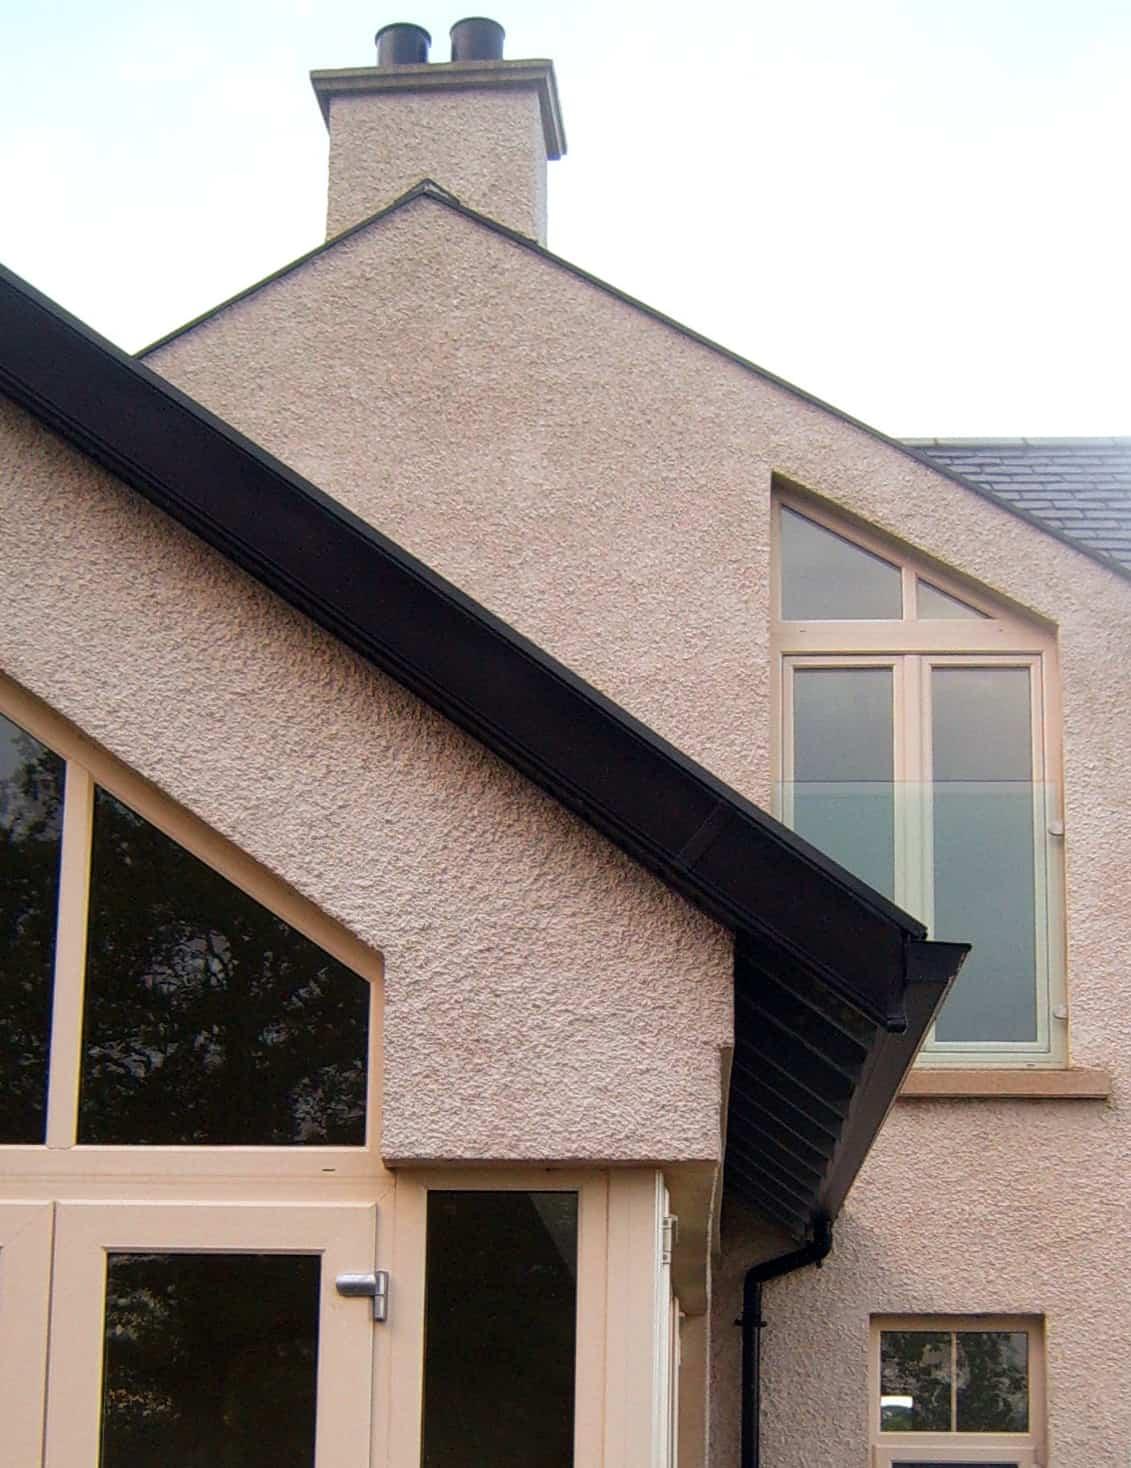 Wilson Dwelling - Detailing Side Elevation Rafter Ends